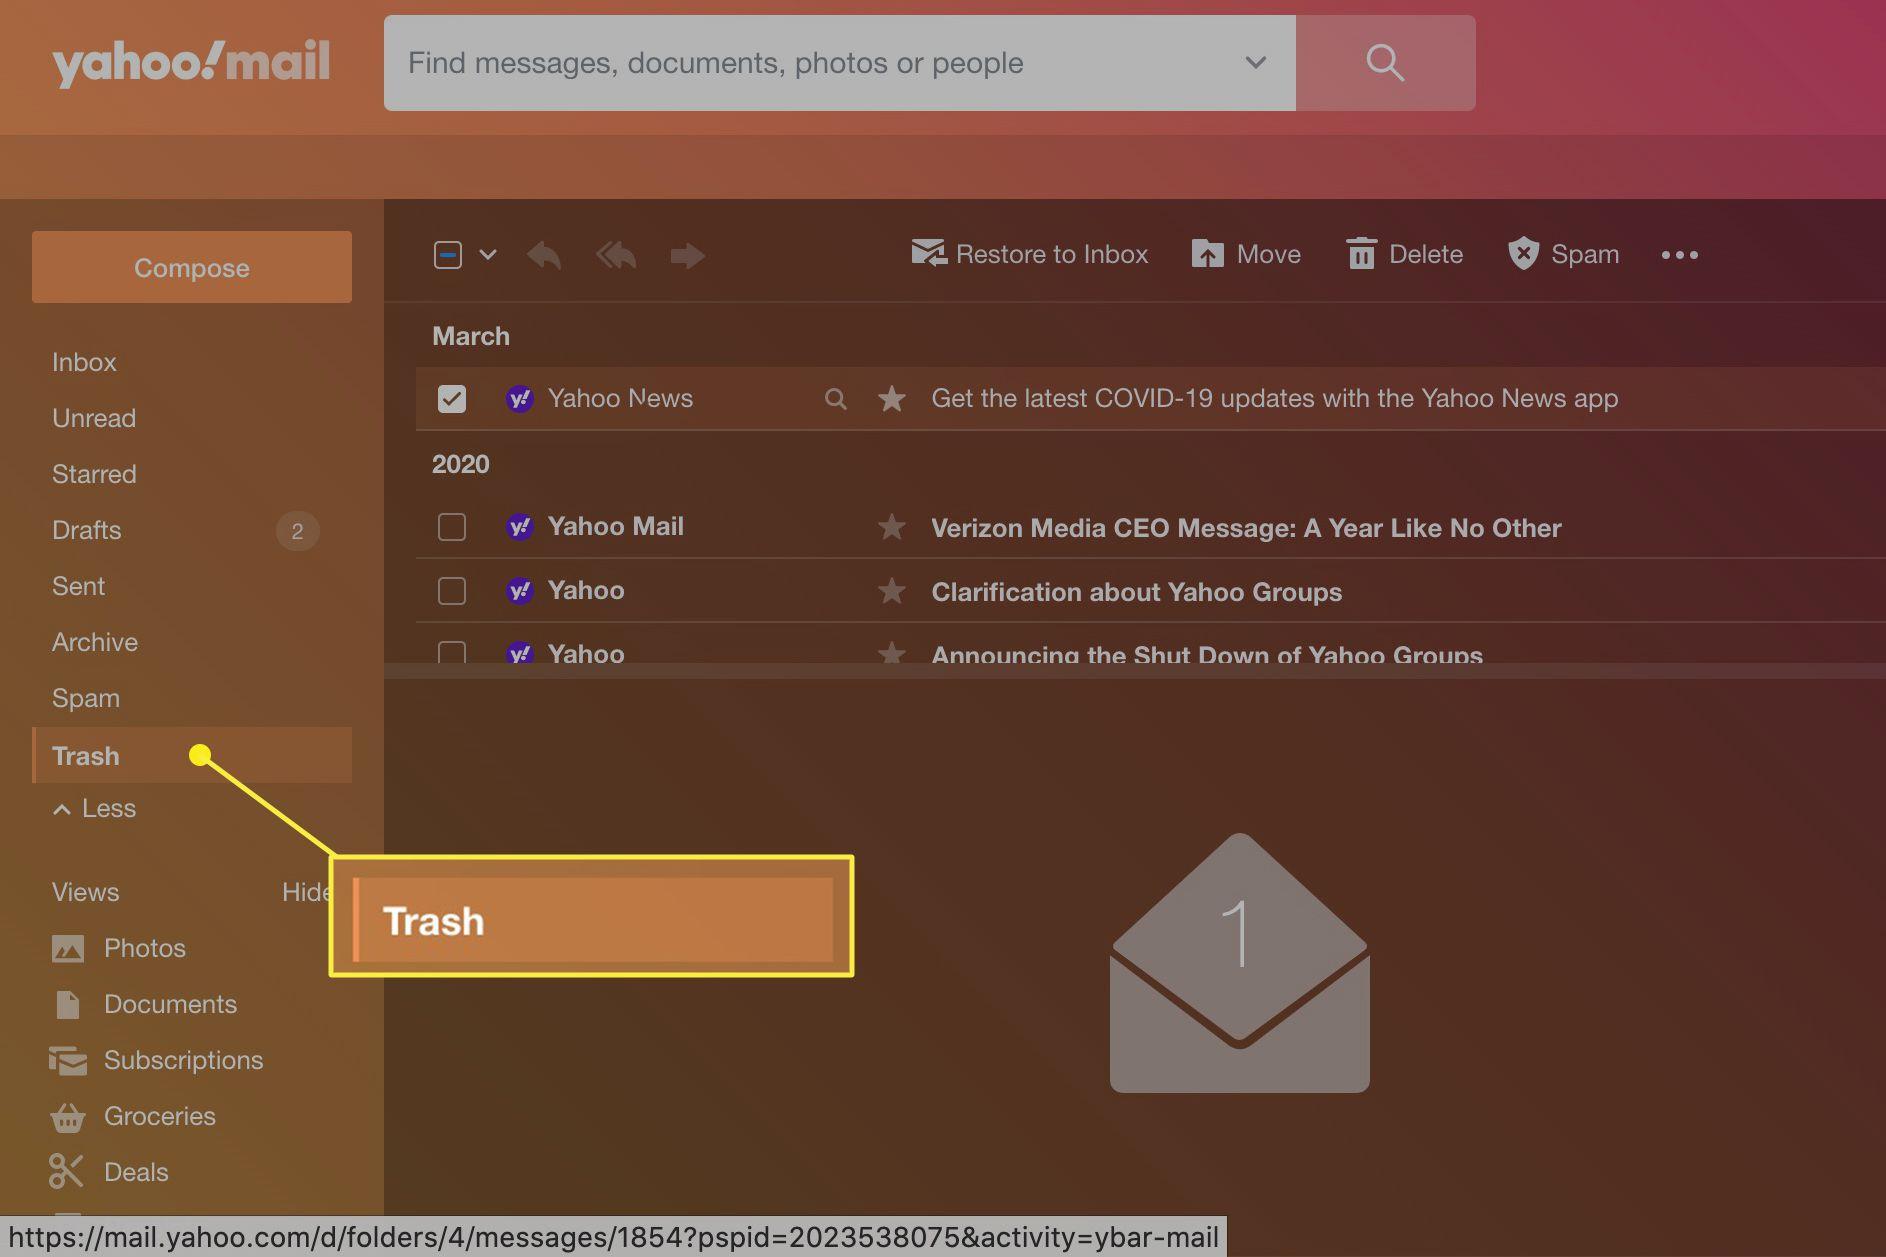 Yahoo Mail Trash in menu